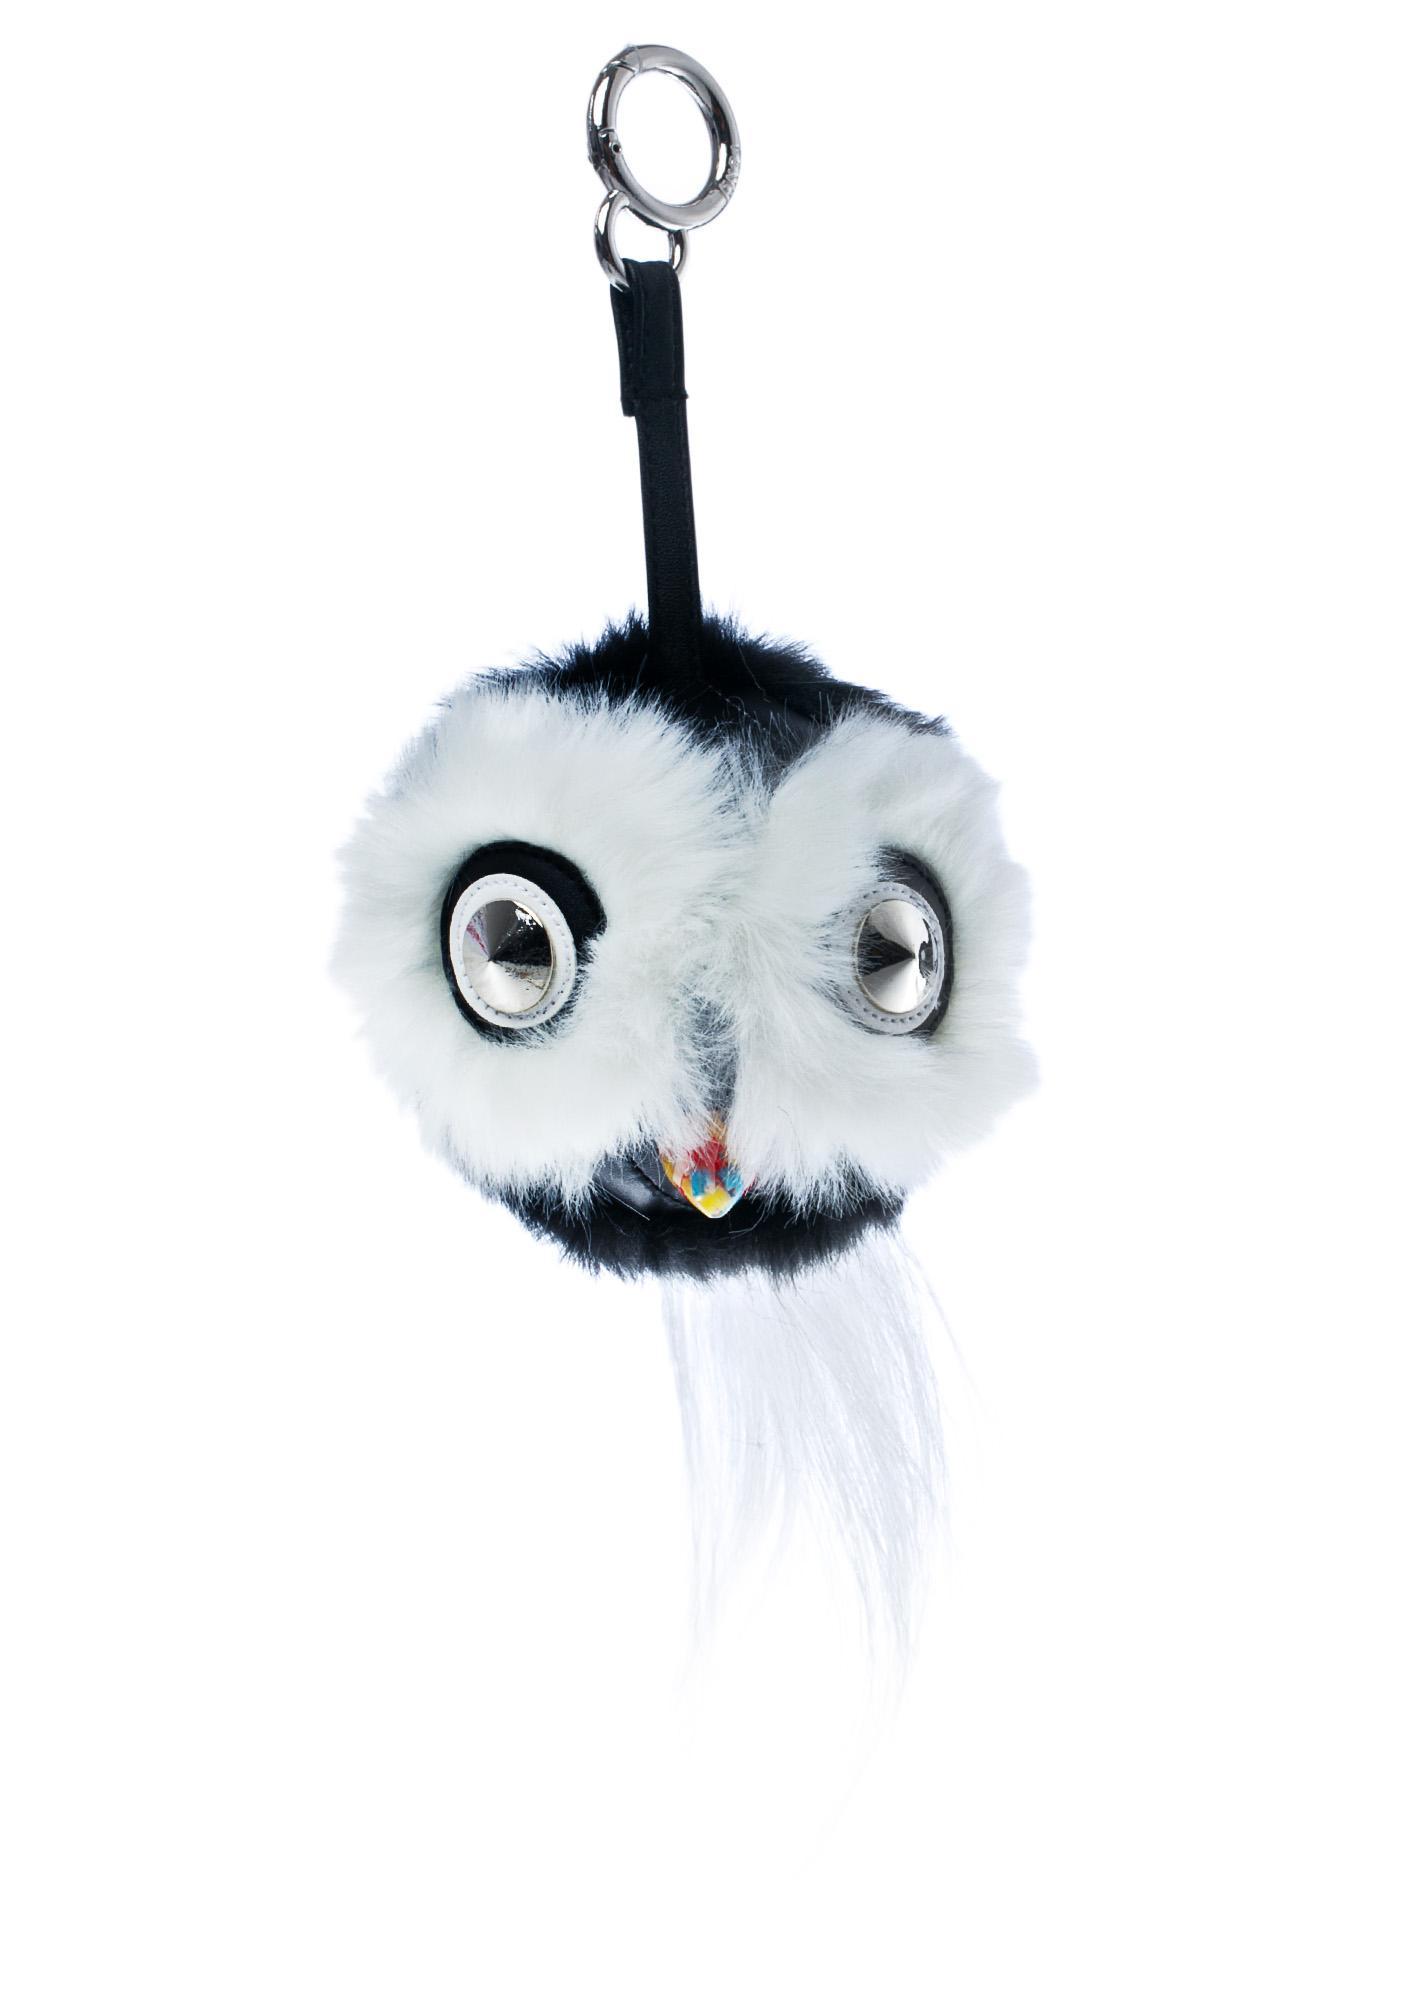 Whata Hoot Fluffy Keychain